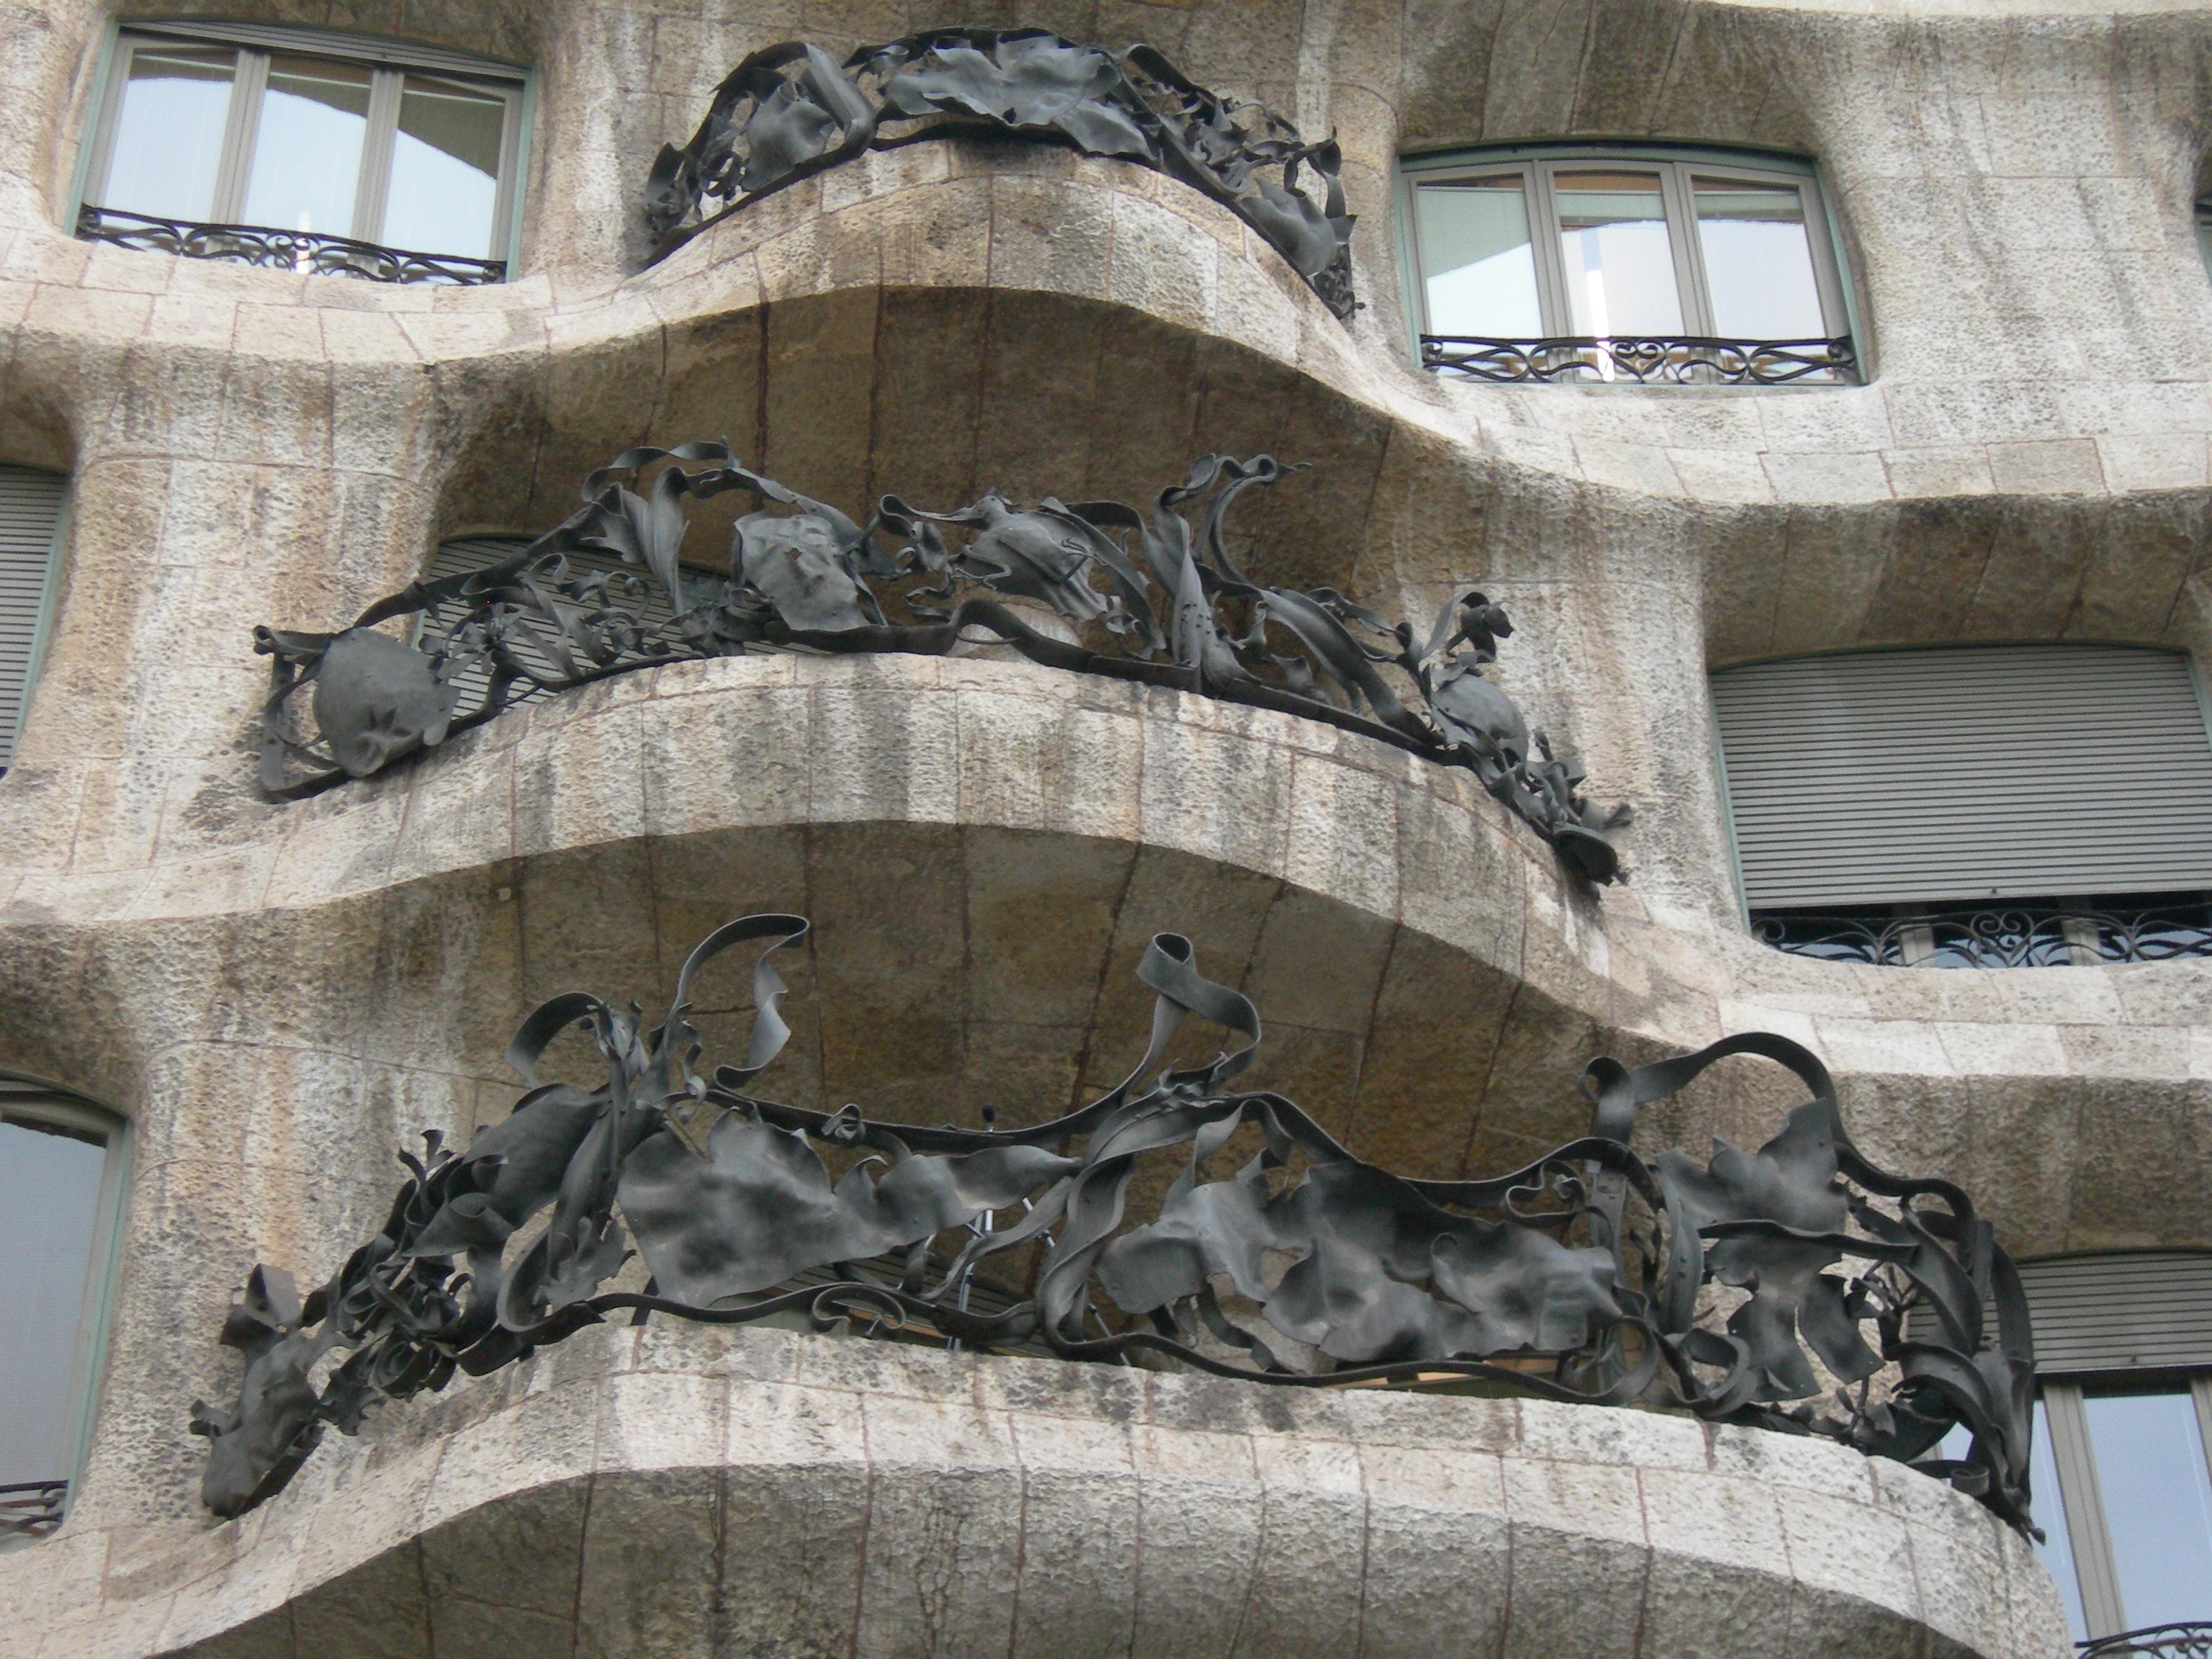 ventana pared monumento estatua fachada barcelona grgola escultura art mural gaud historia hierro tallado modernismo